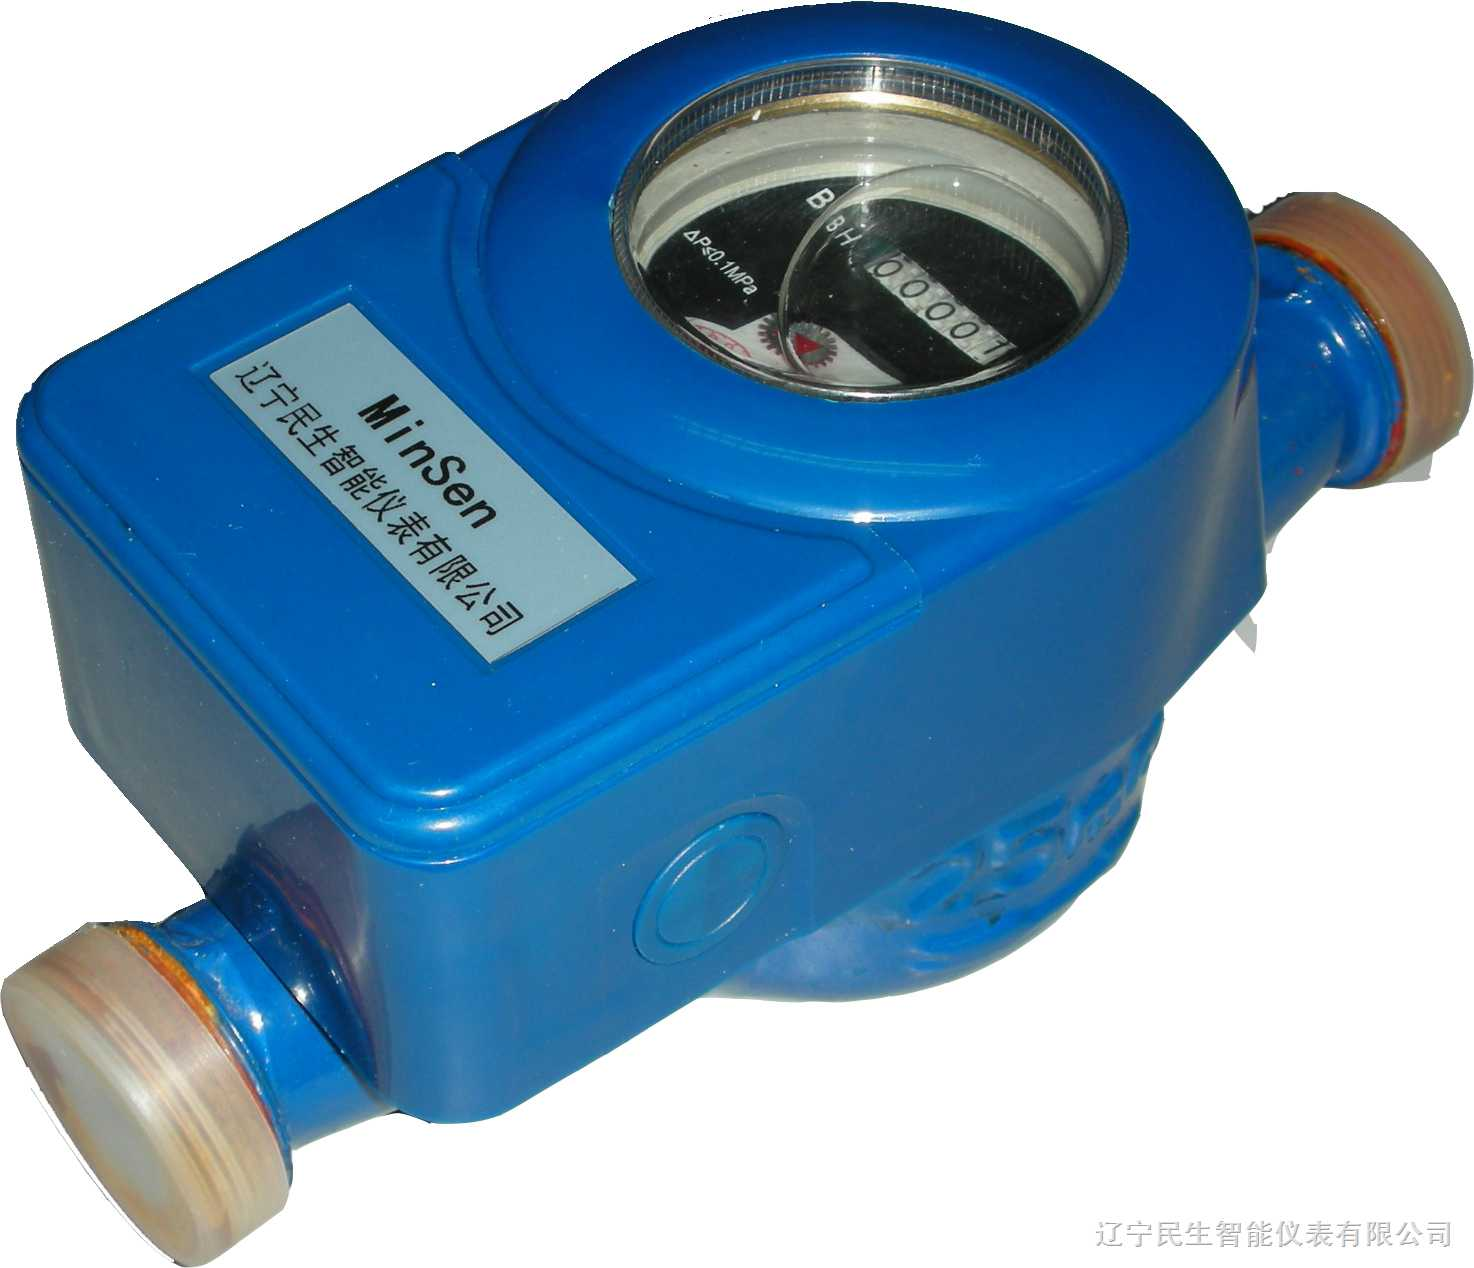 LXSZ 系列无线远传智能阀控湿式水表